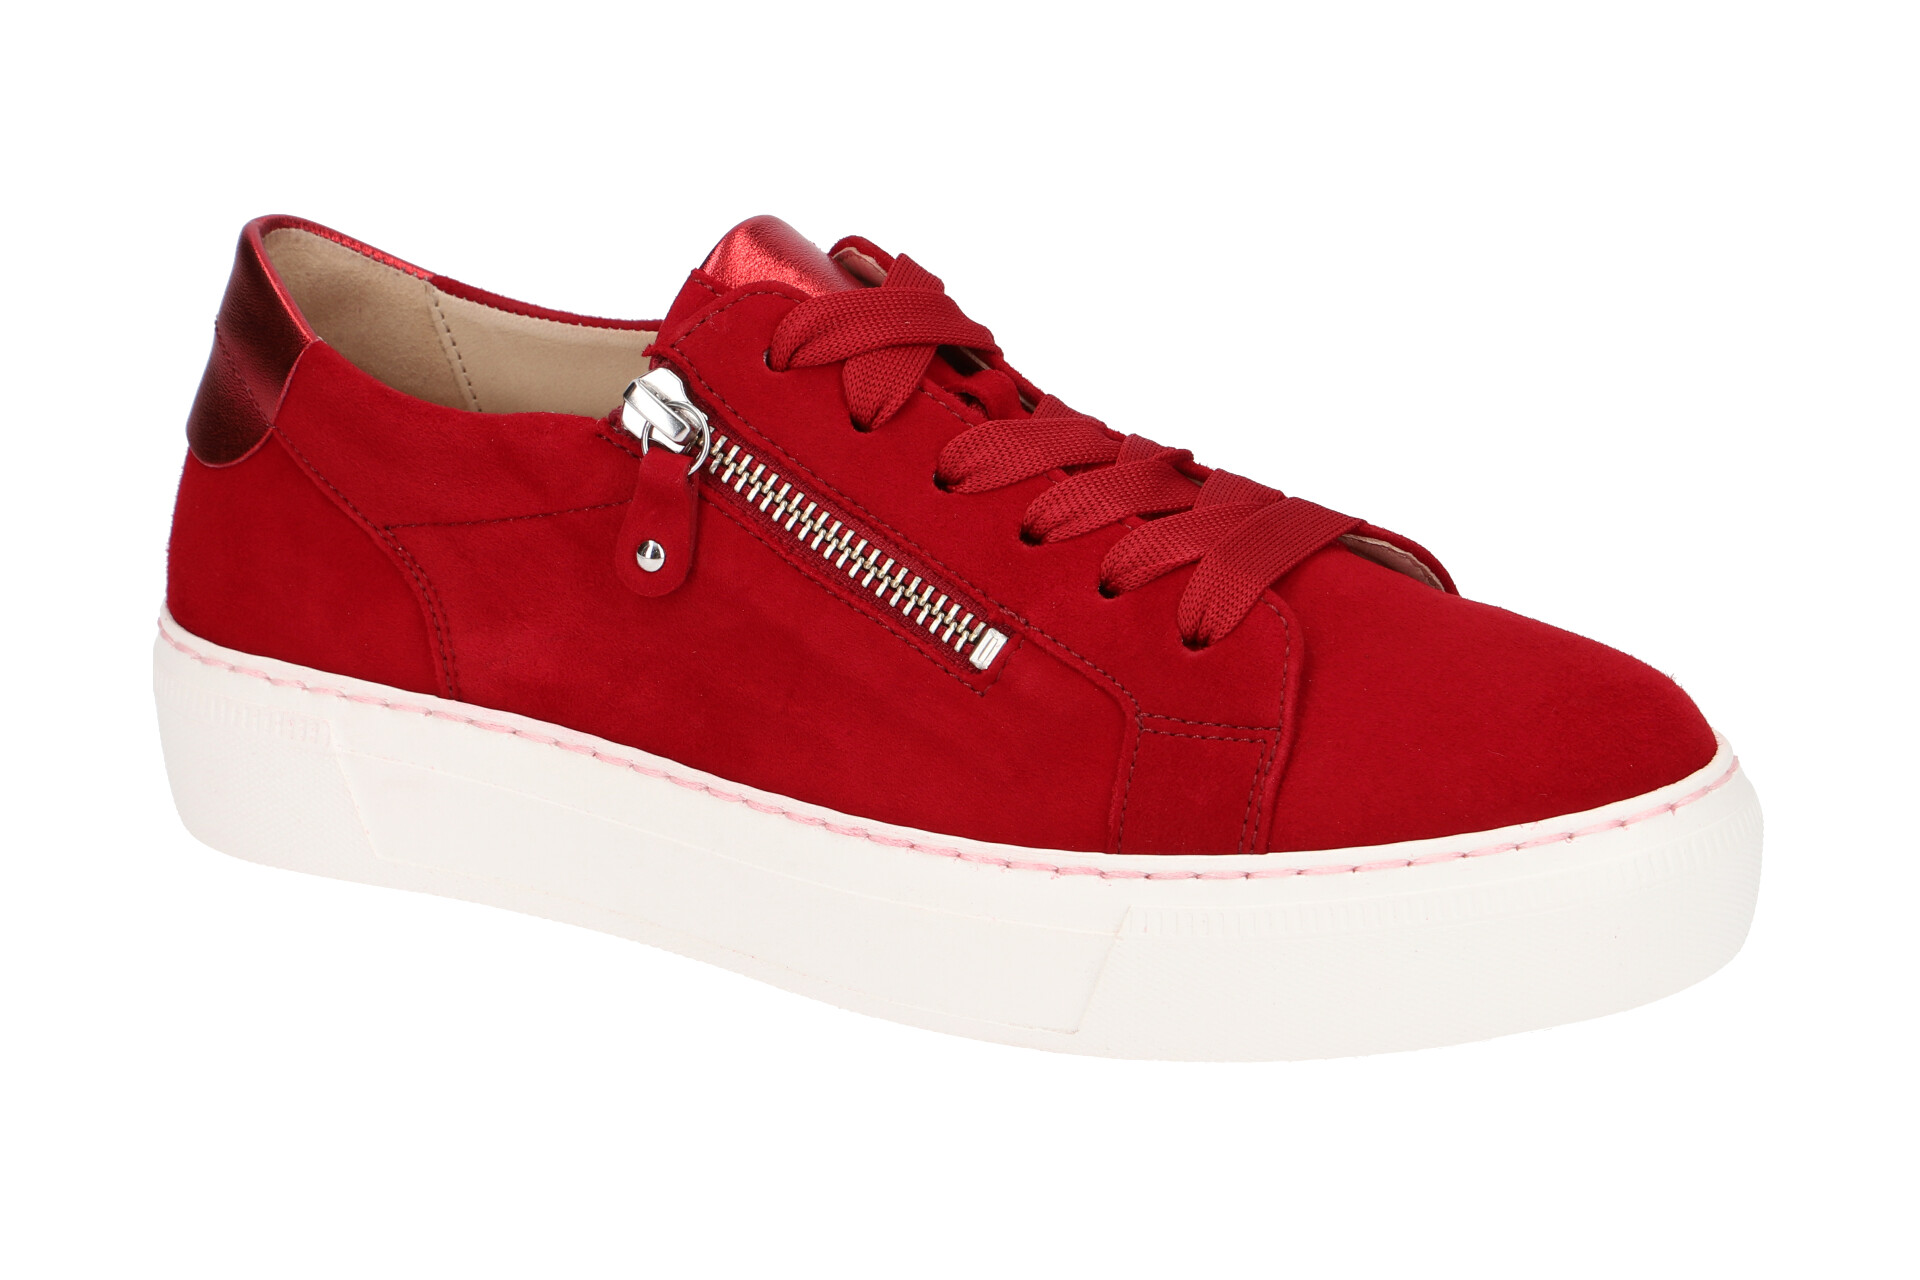 Gabor Schuhe rot Damen Sneakers 23.314.10